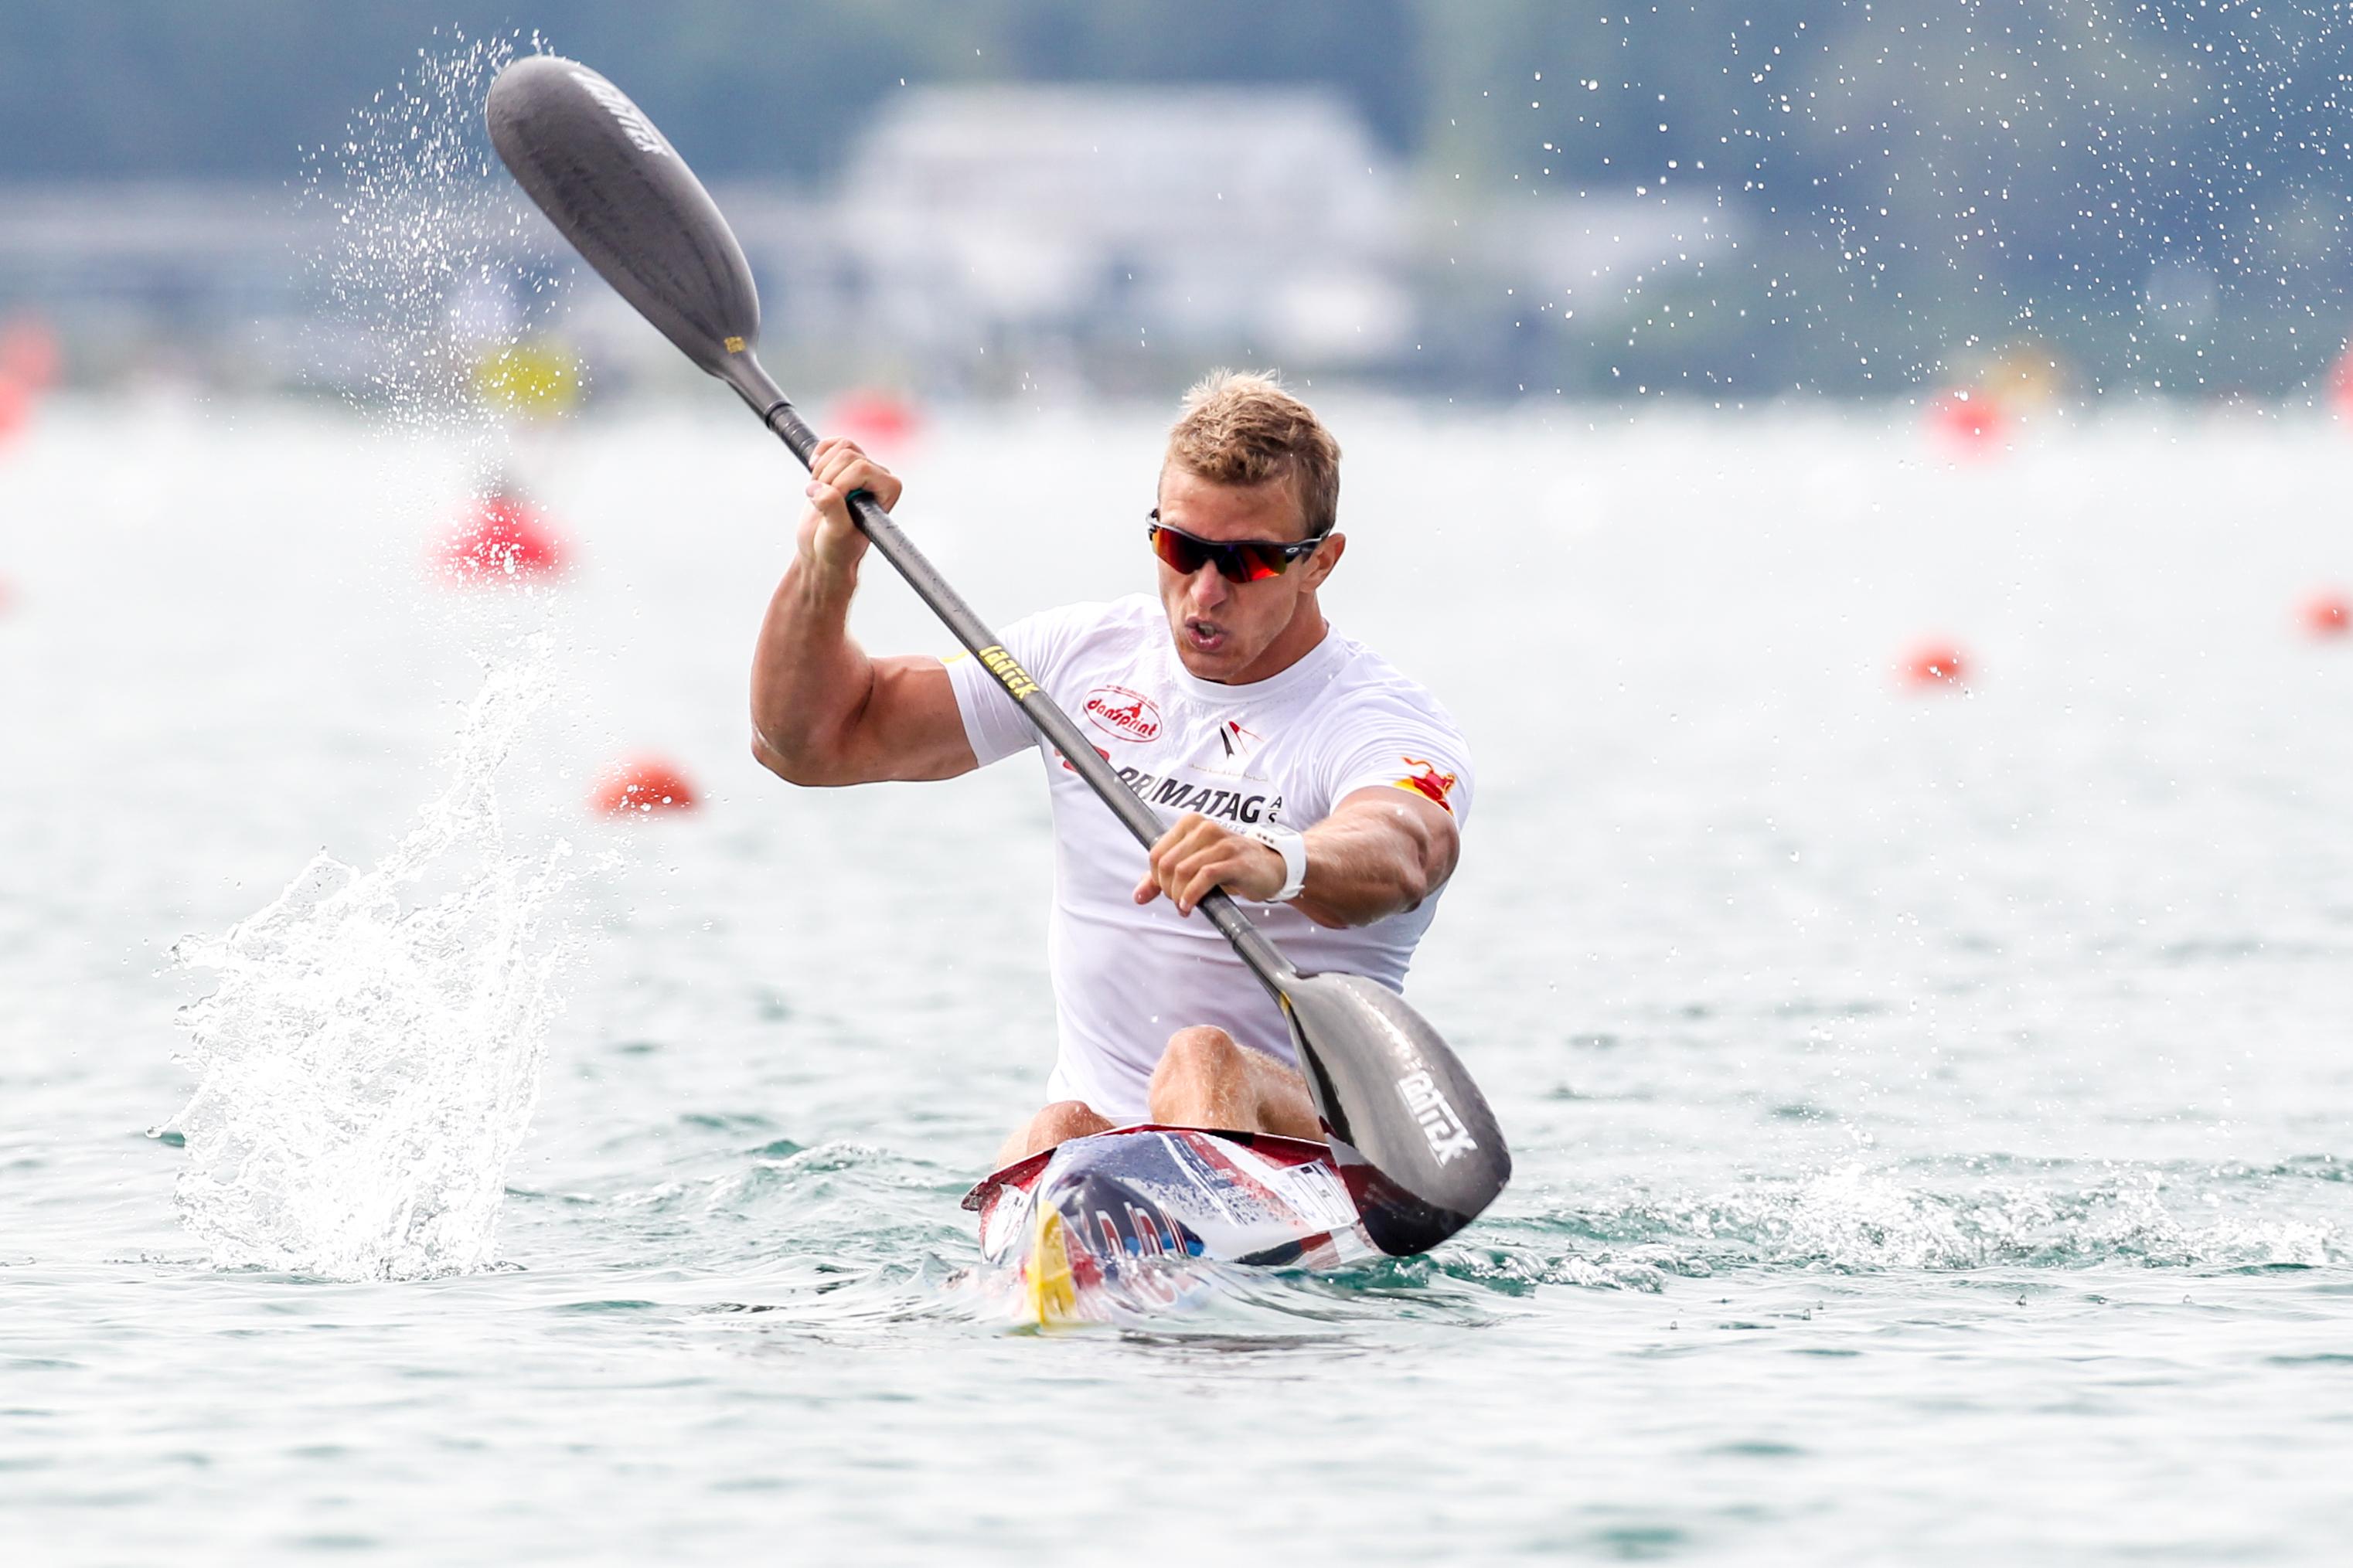 Rene Holten Poulsen VM 2015